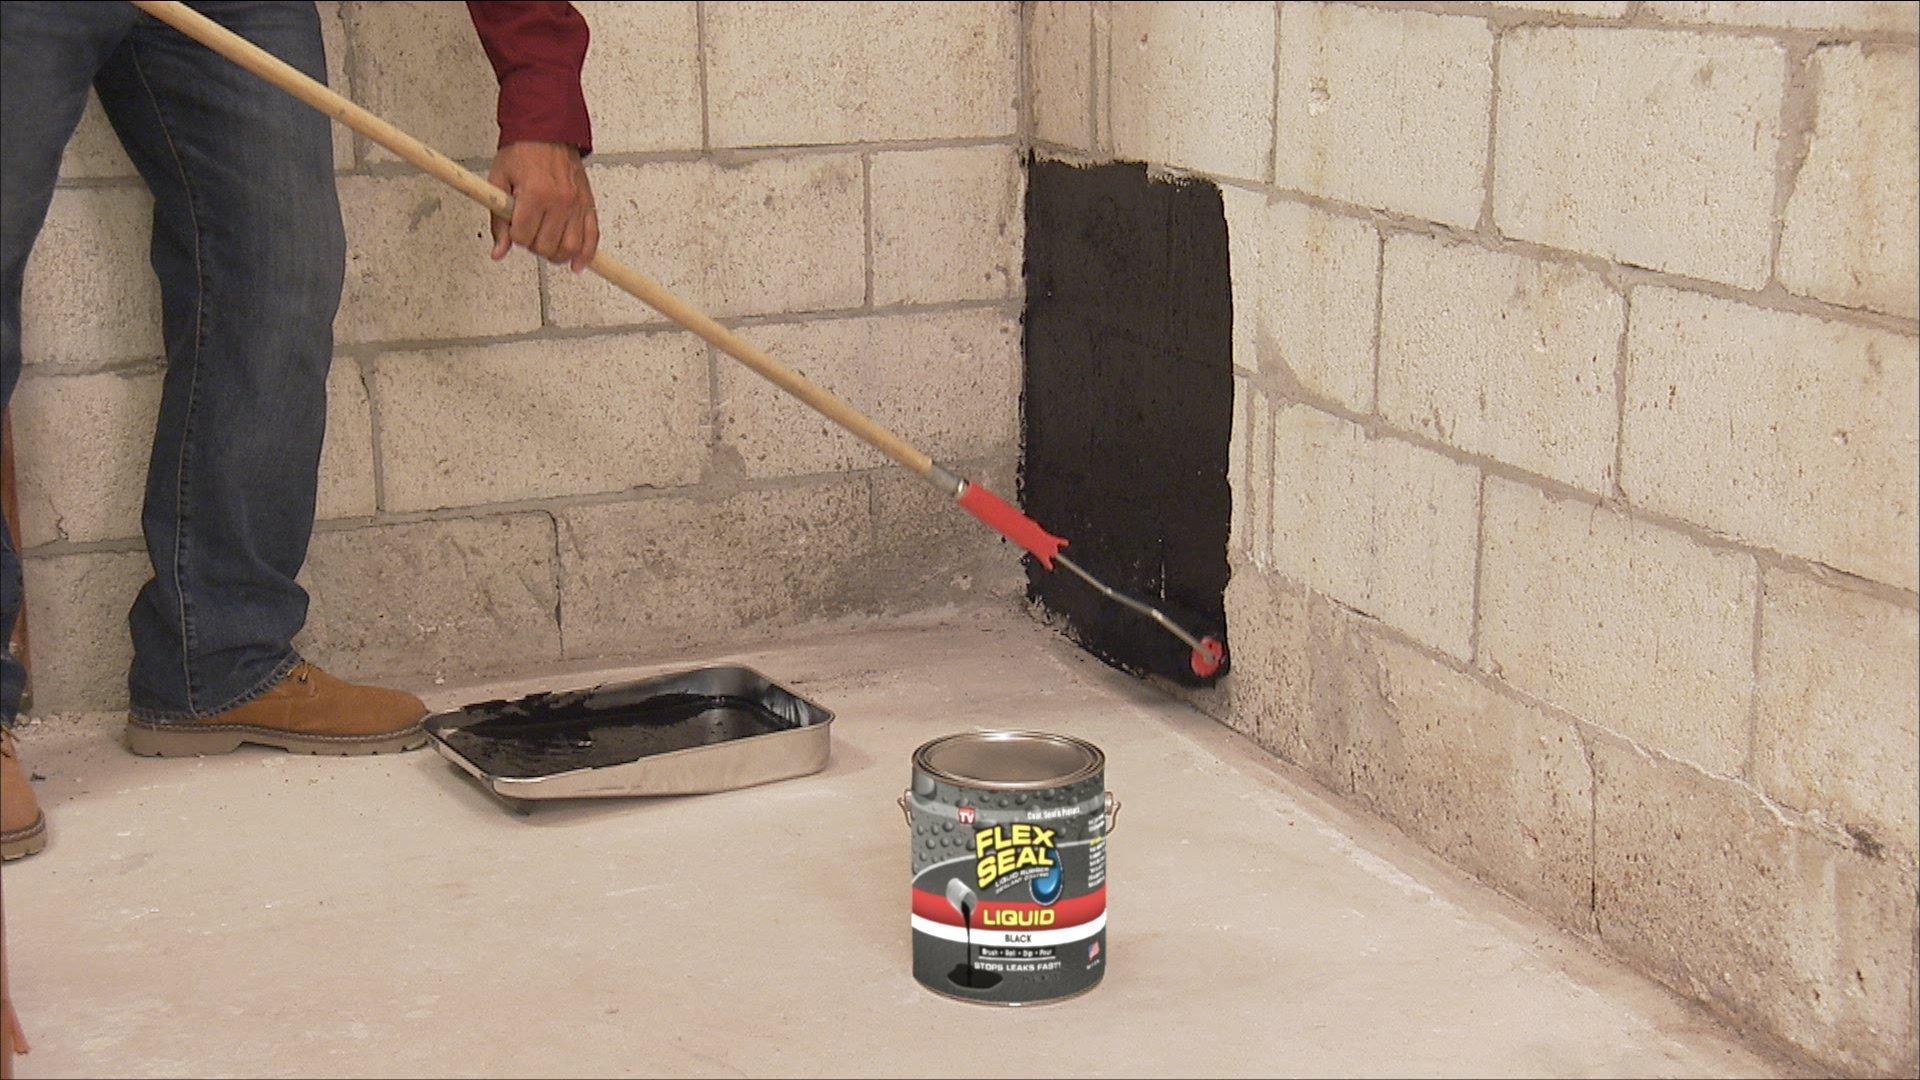 Flex Seal Liquid Rubber in a Can, 32-oz, Black by Flex Seal Liquid (Image #6)